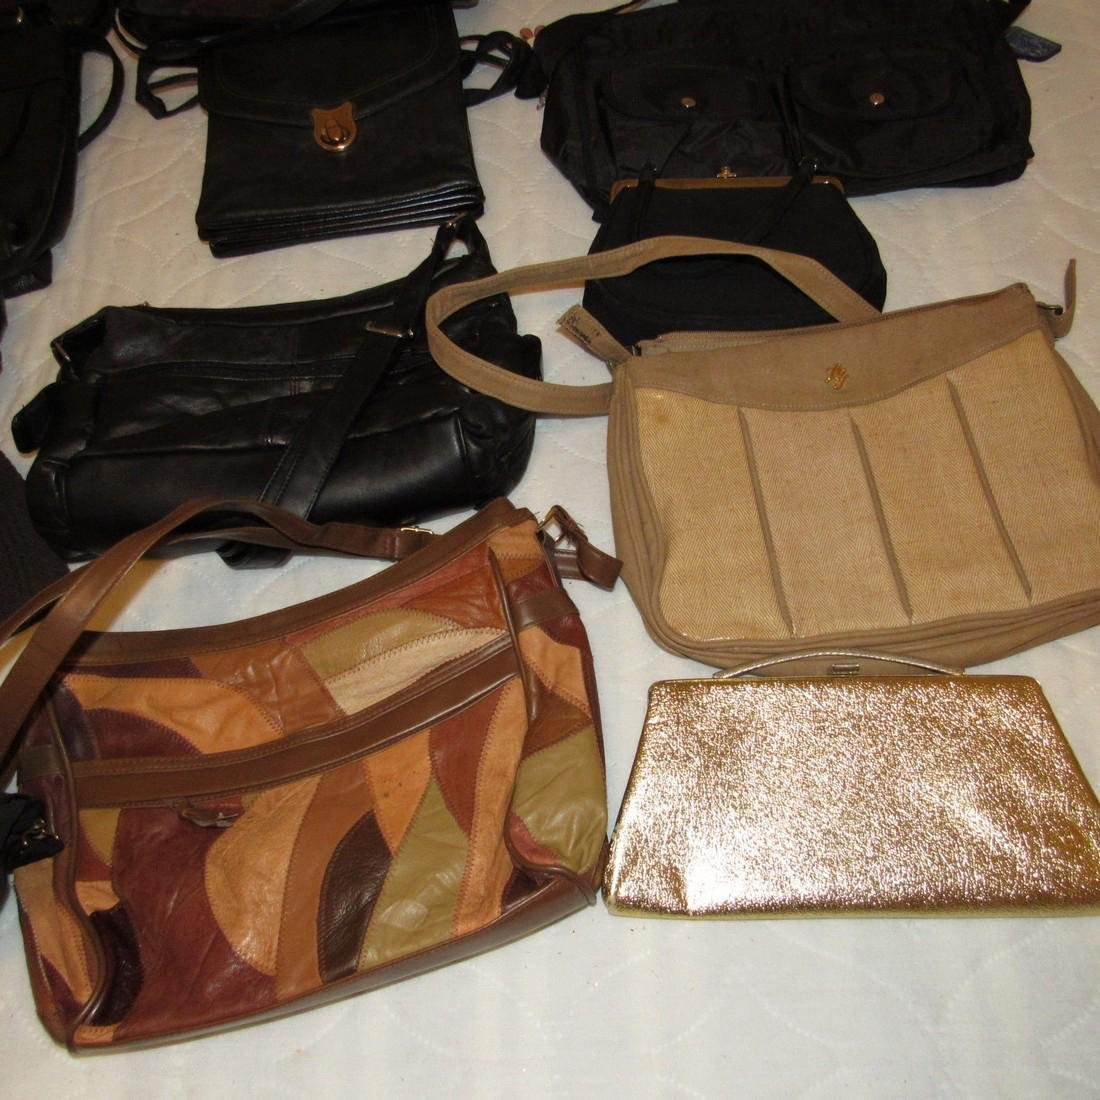 Vintage Purses and Handbags Lot - 2